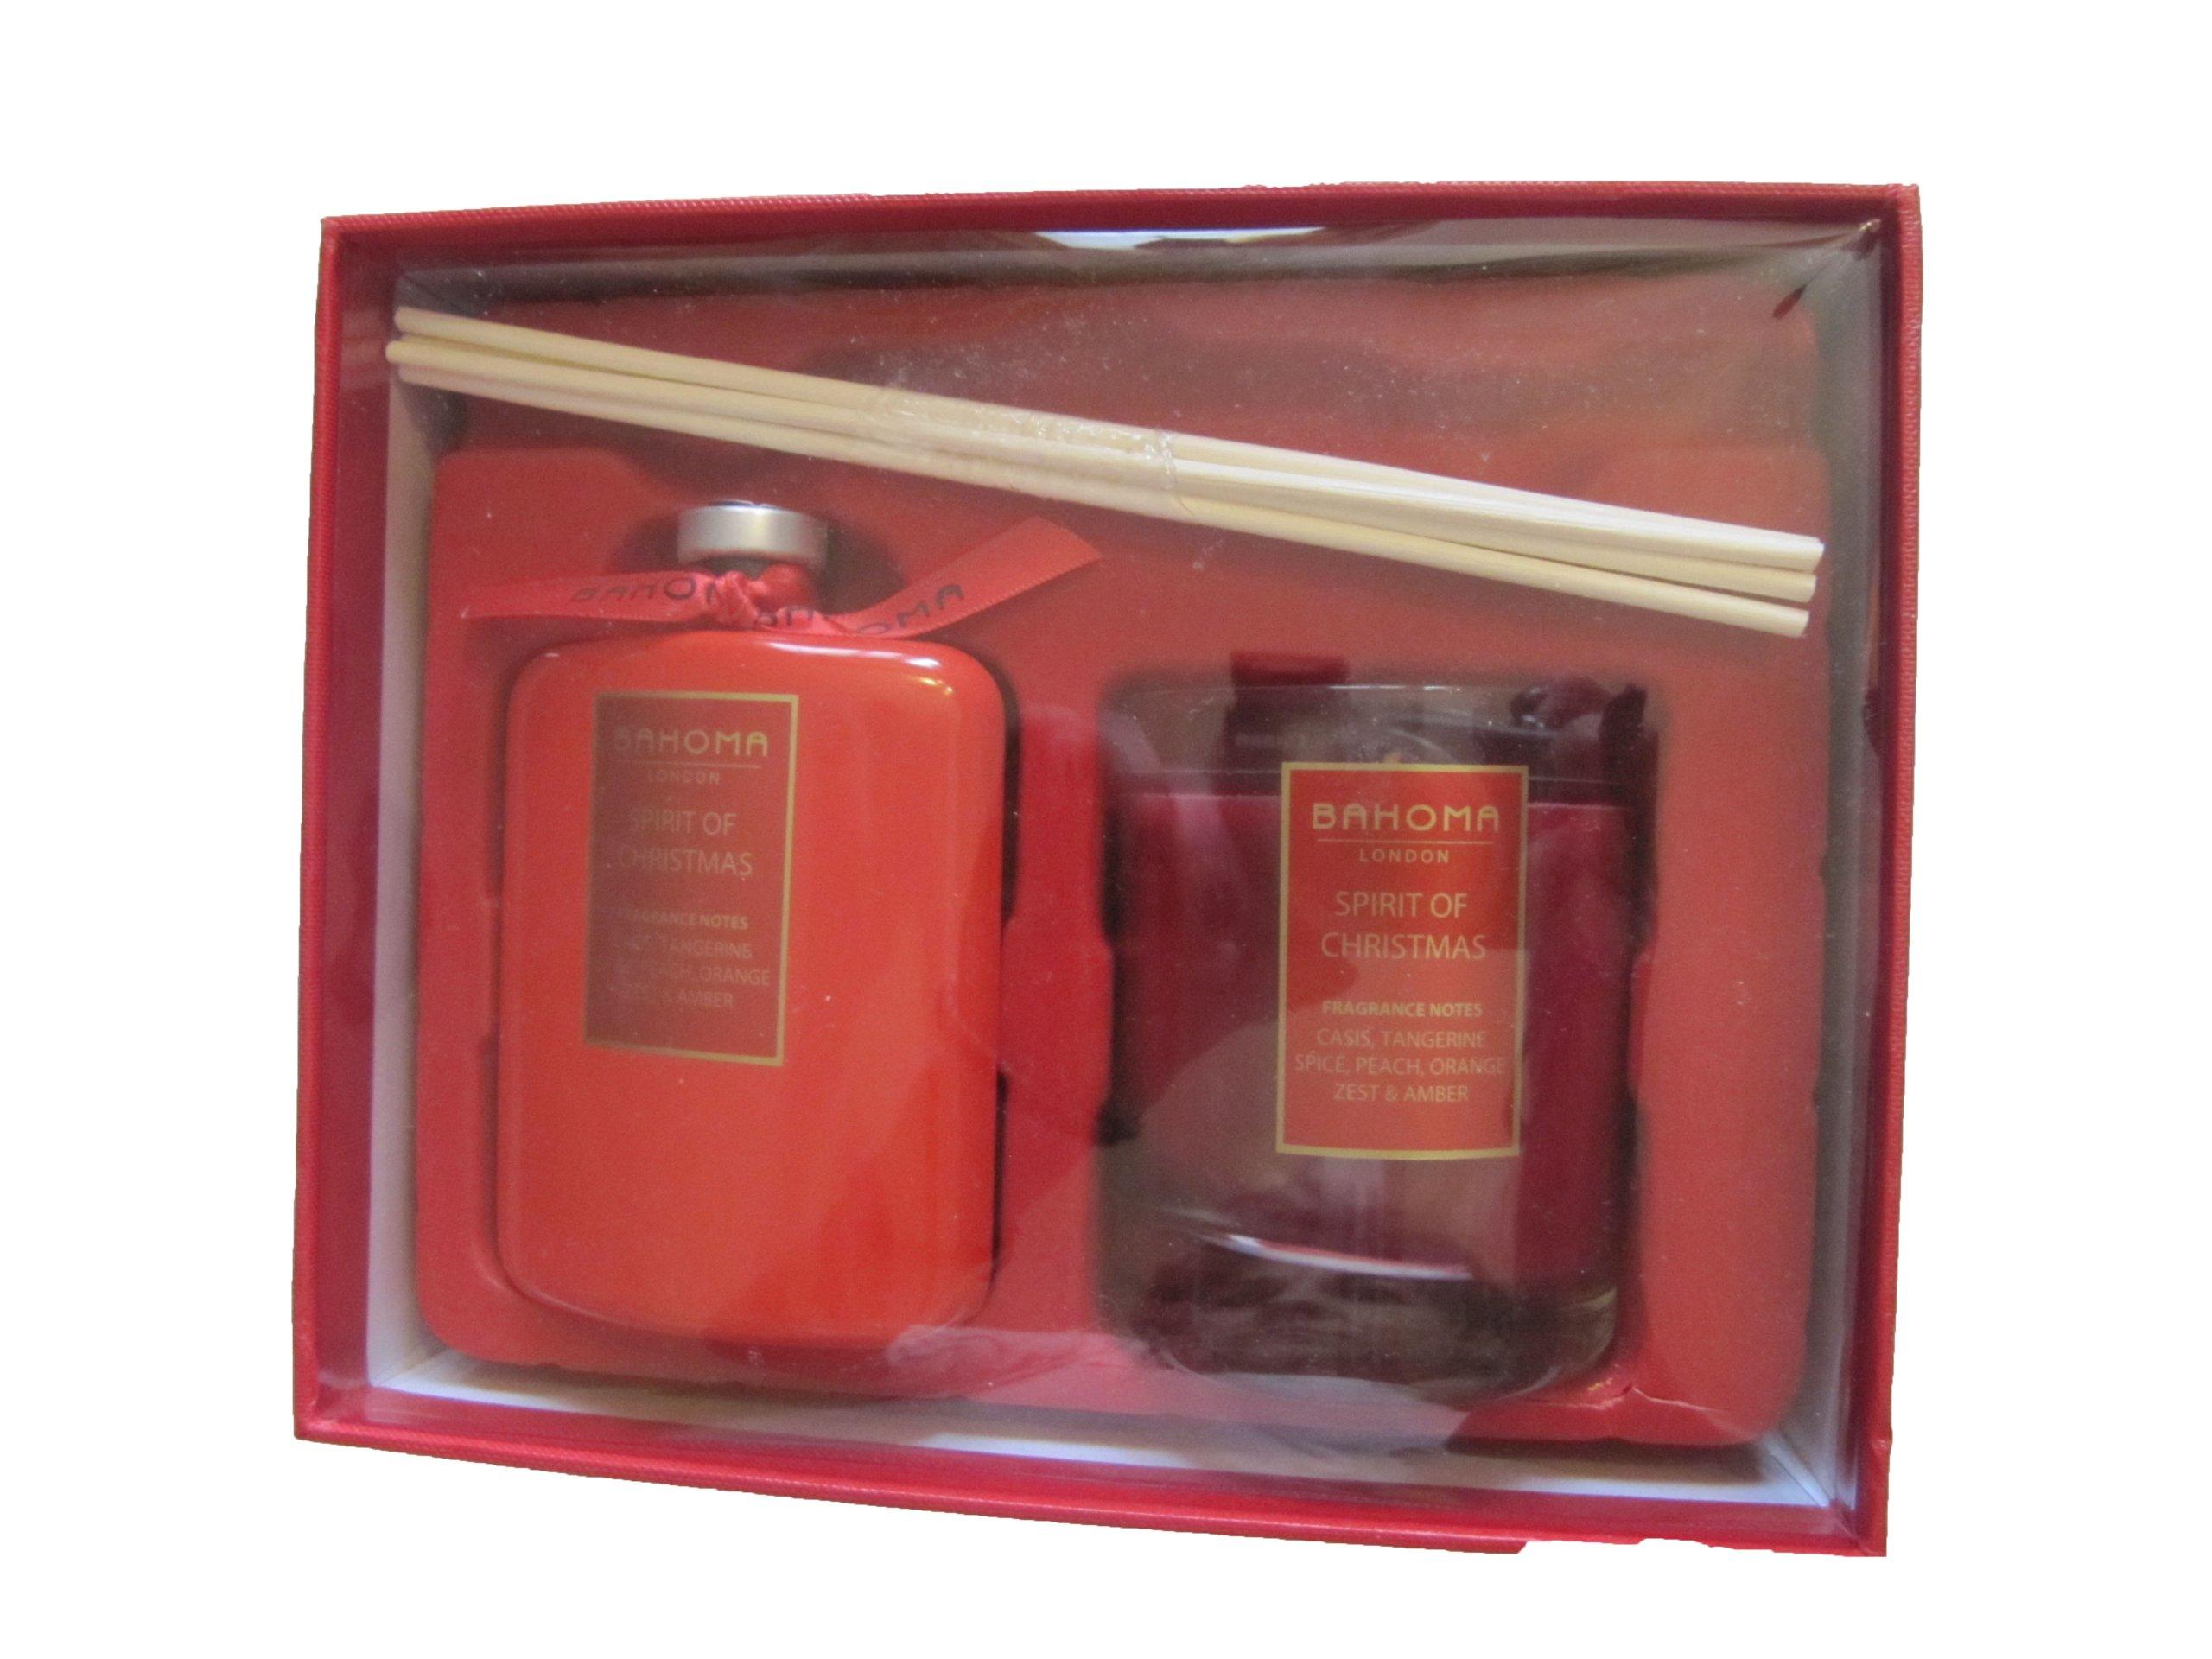 Bahoma London Candle & Diffuser Set Spirit of Christmas